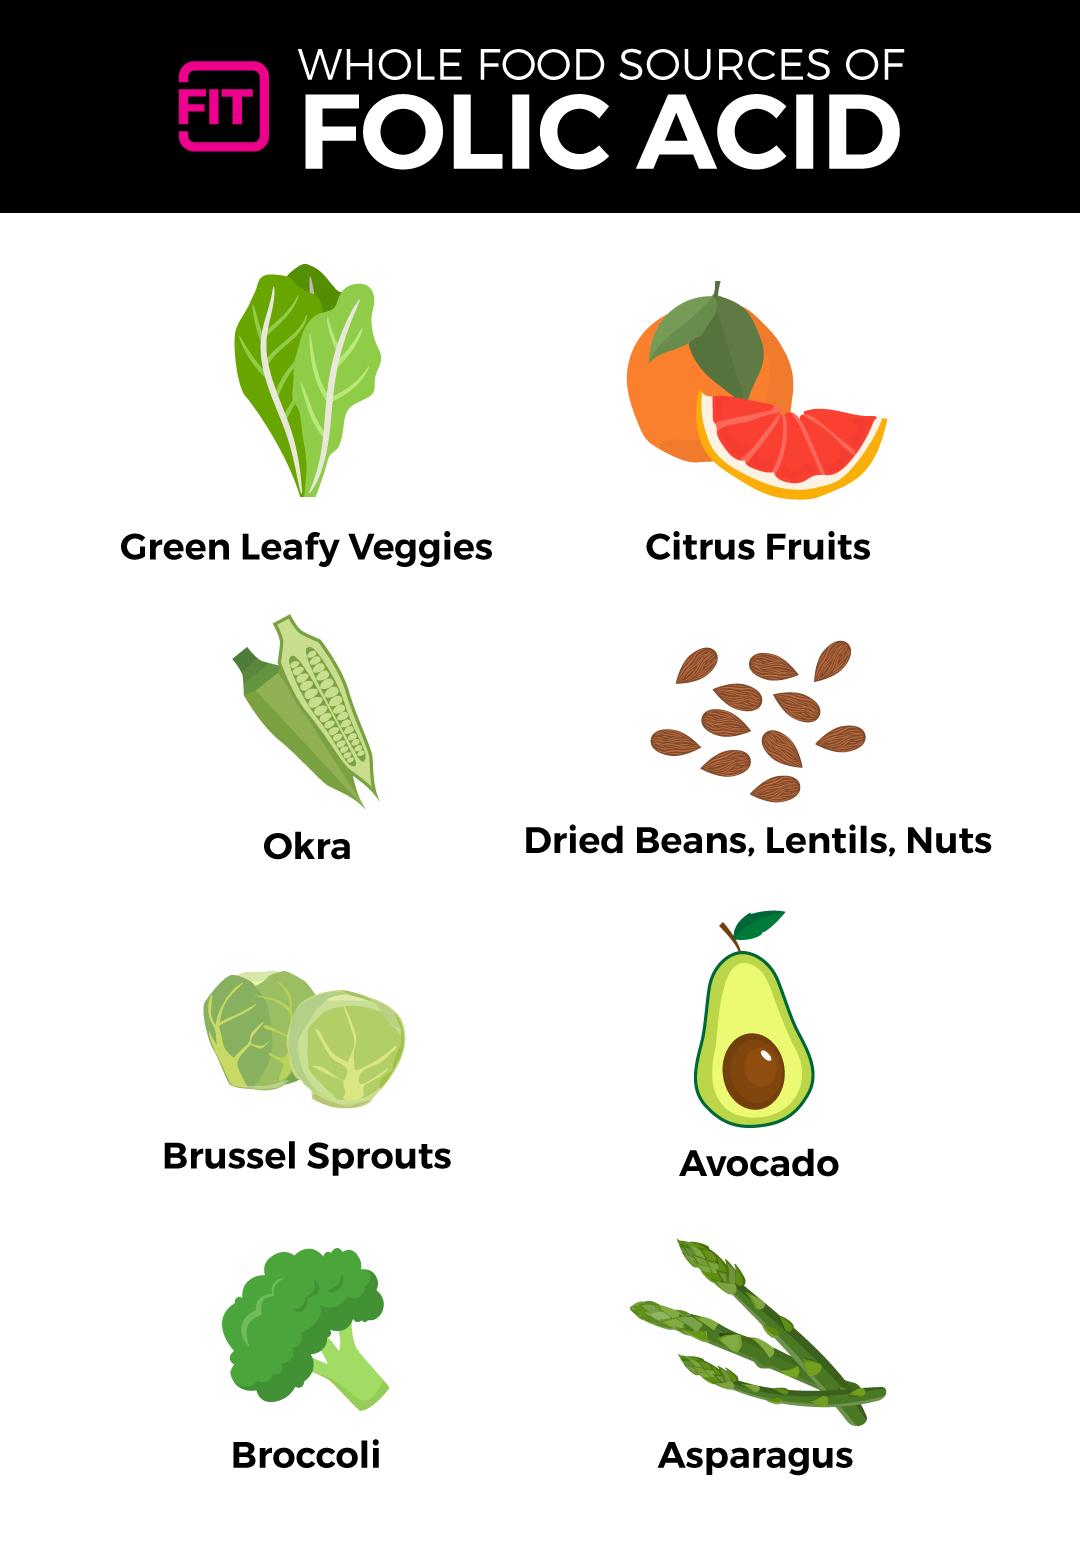 foods with folic acid infographic